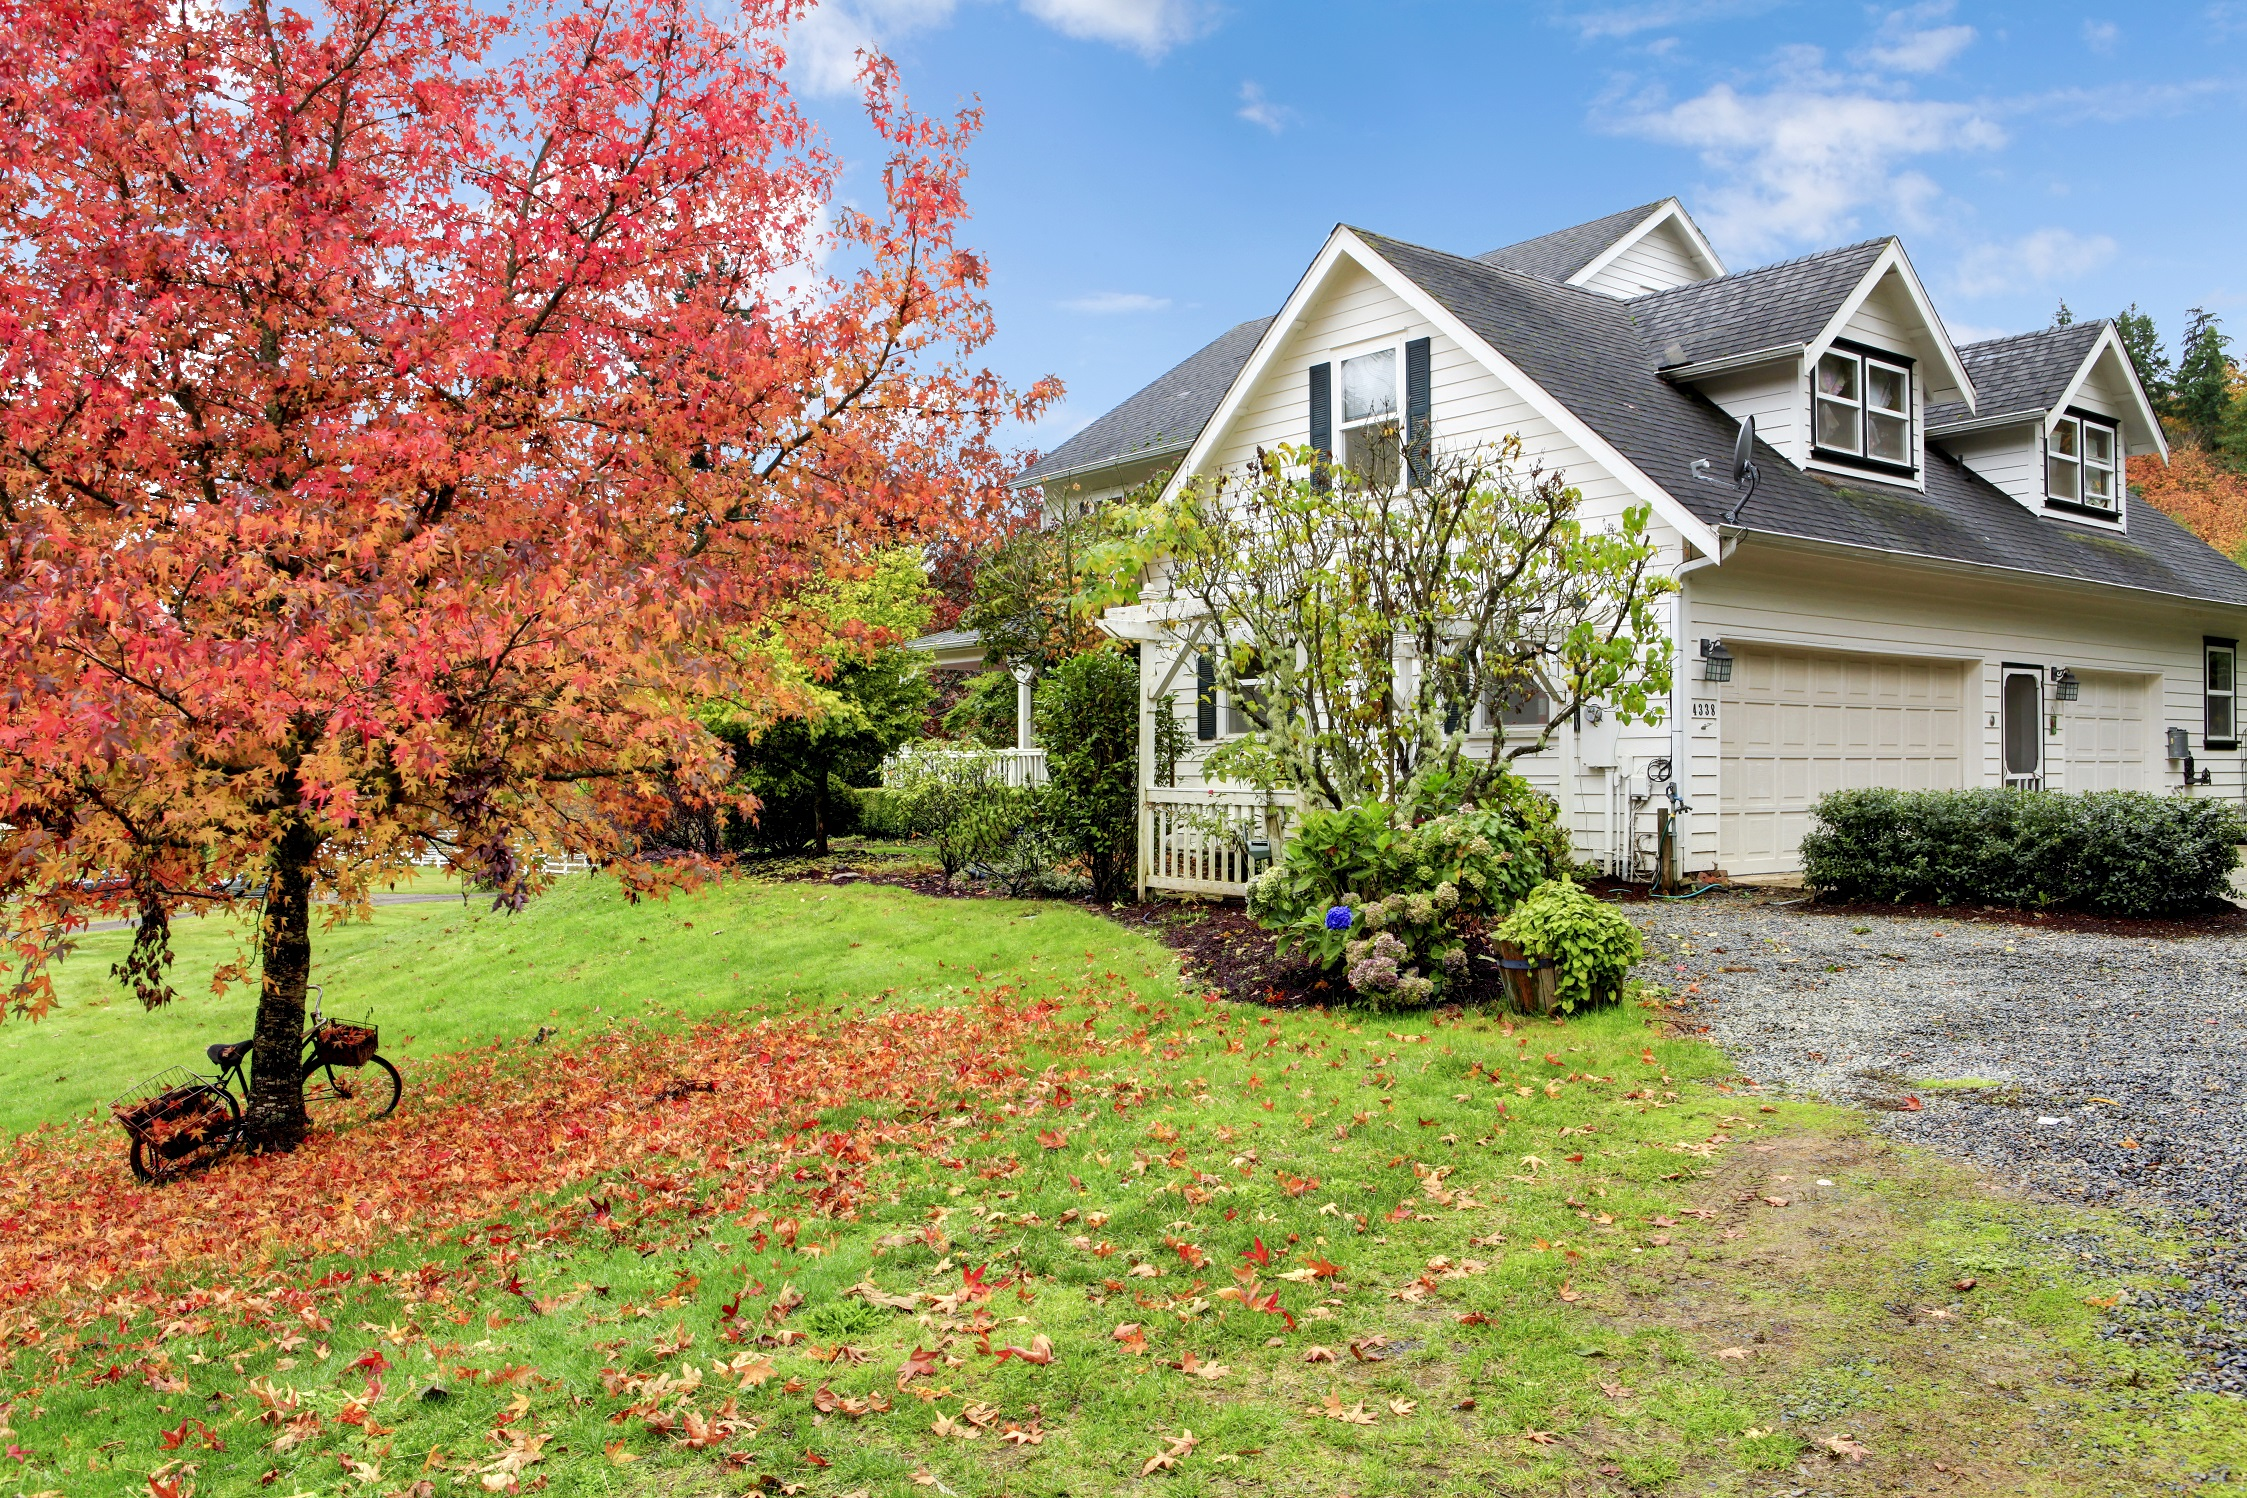 Regina Wittosch Associate Broker With Better Homes And